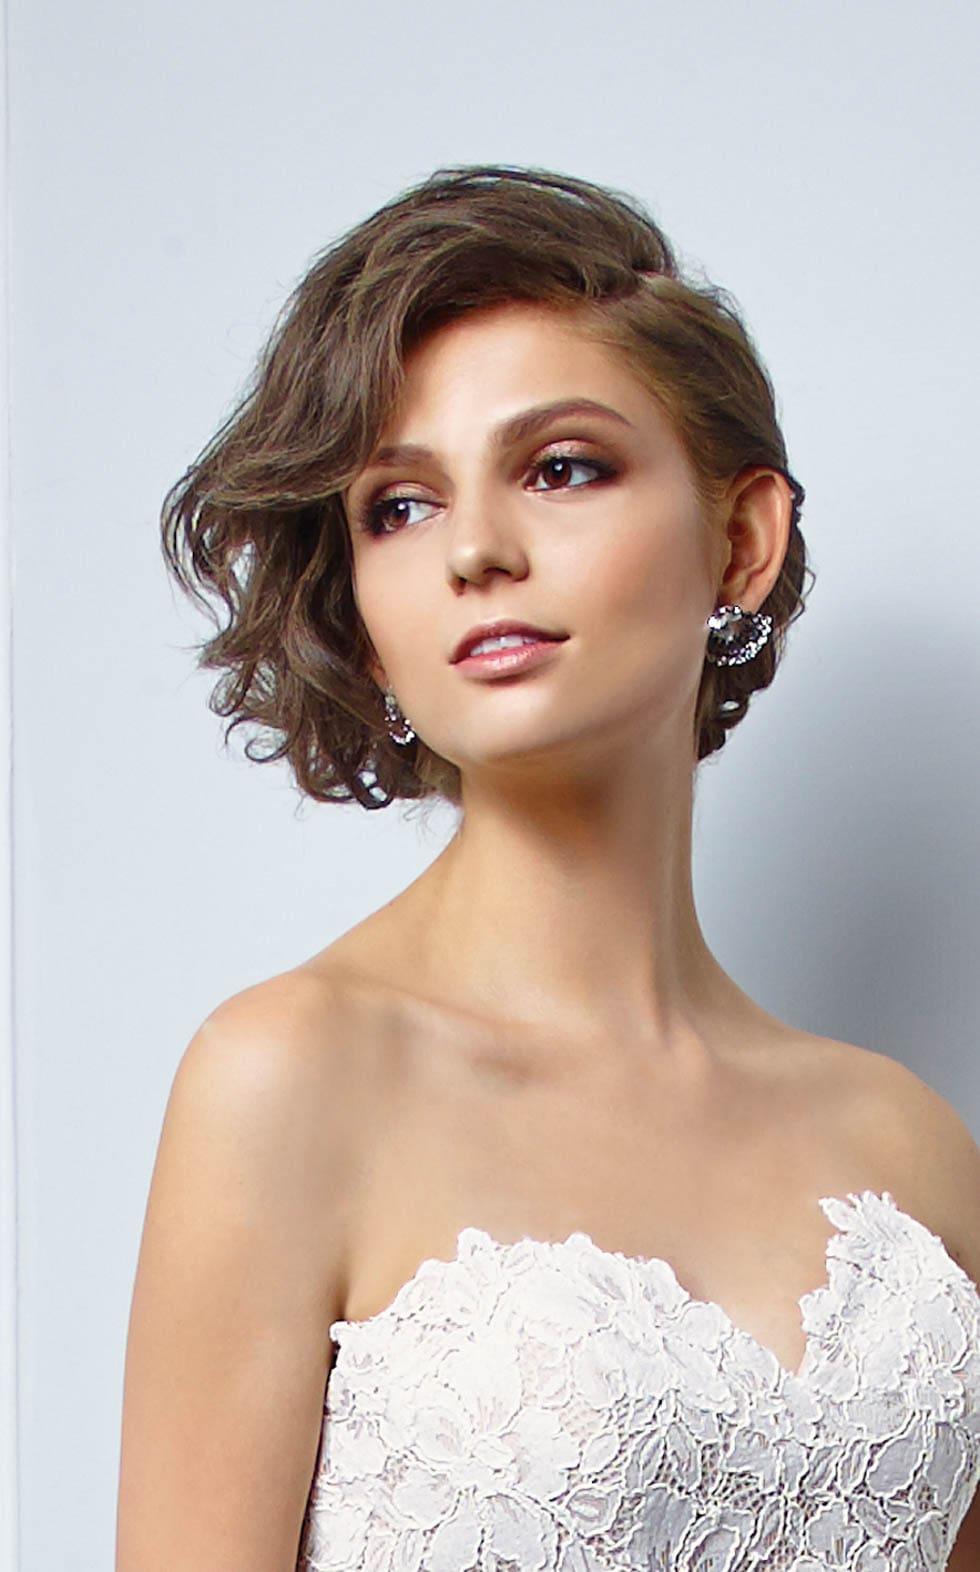 Galerie 26 Brautfrisuren Fur Kurzes Oder Schulterlanges Haar